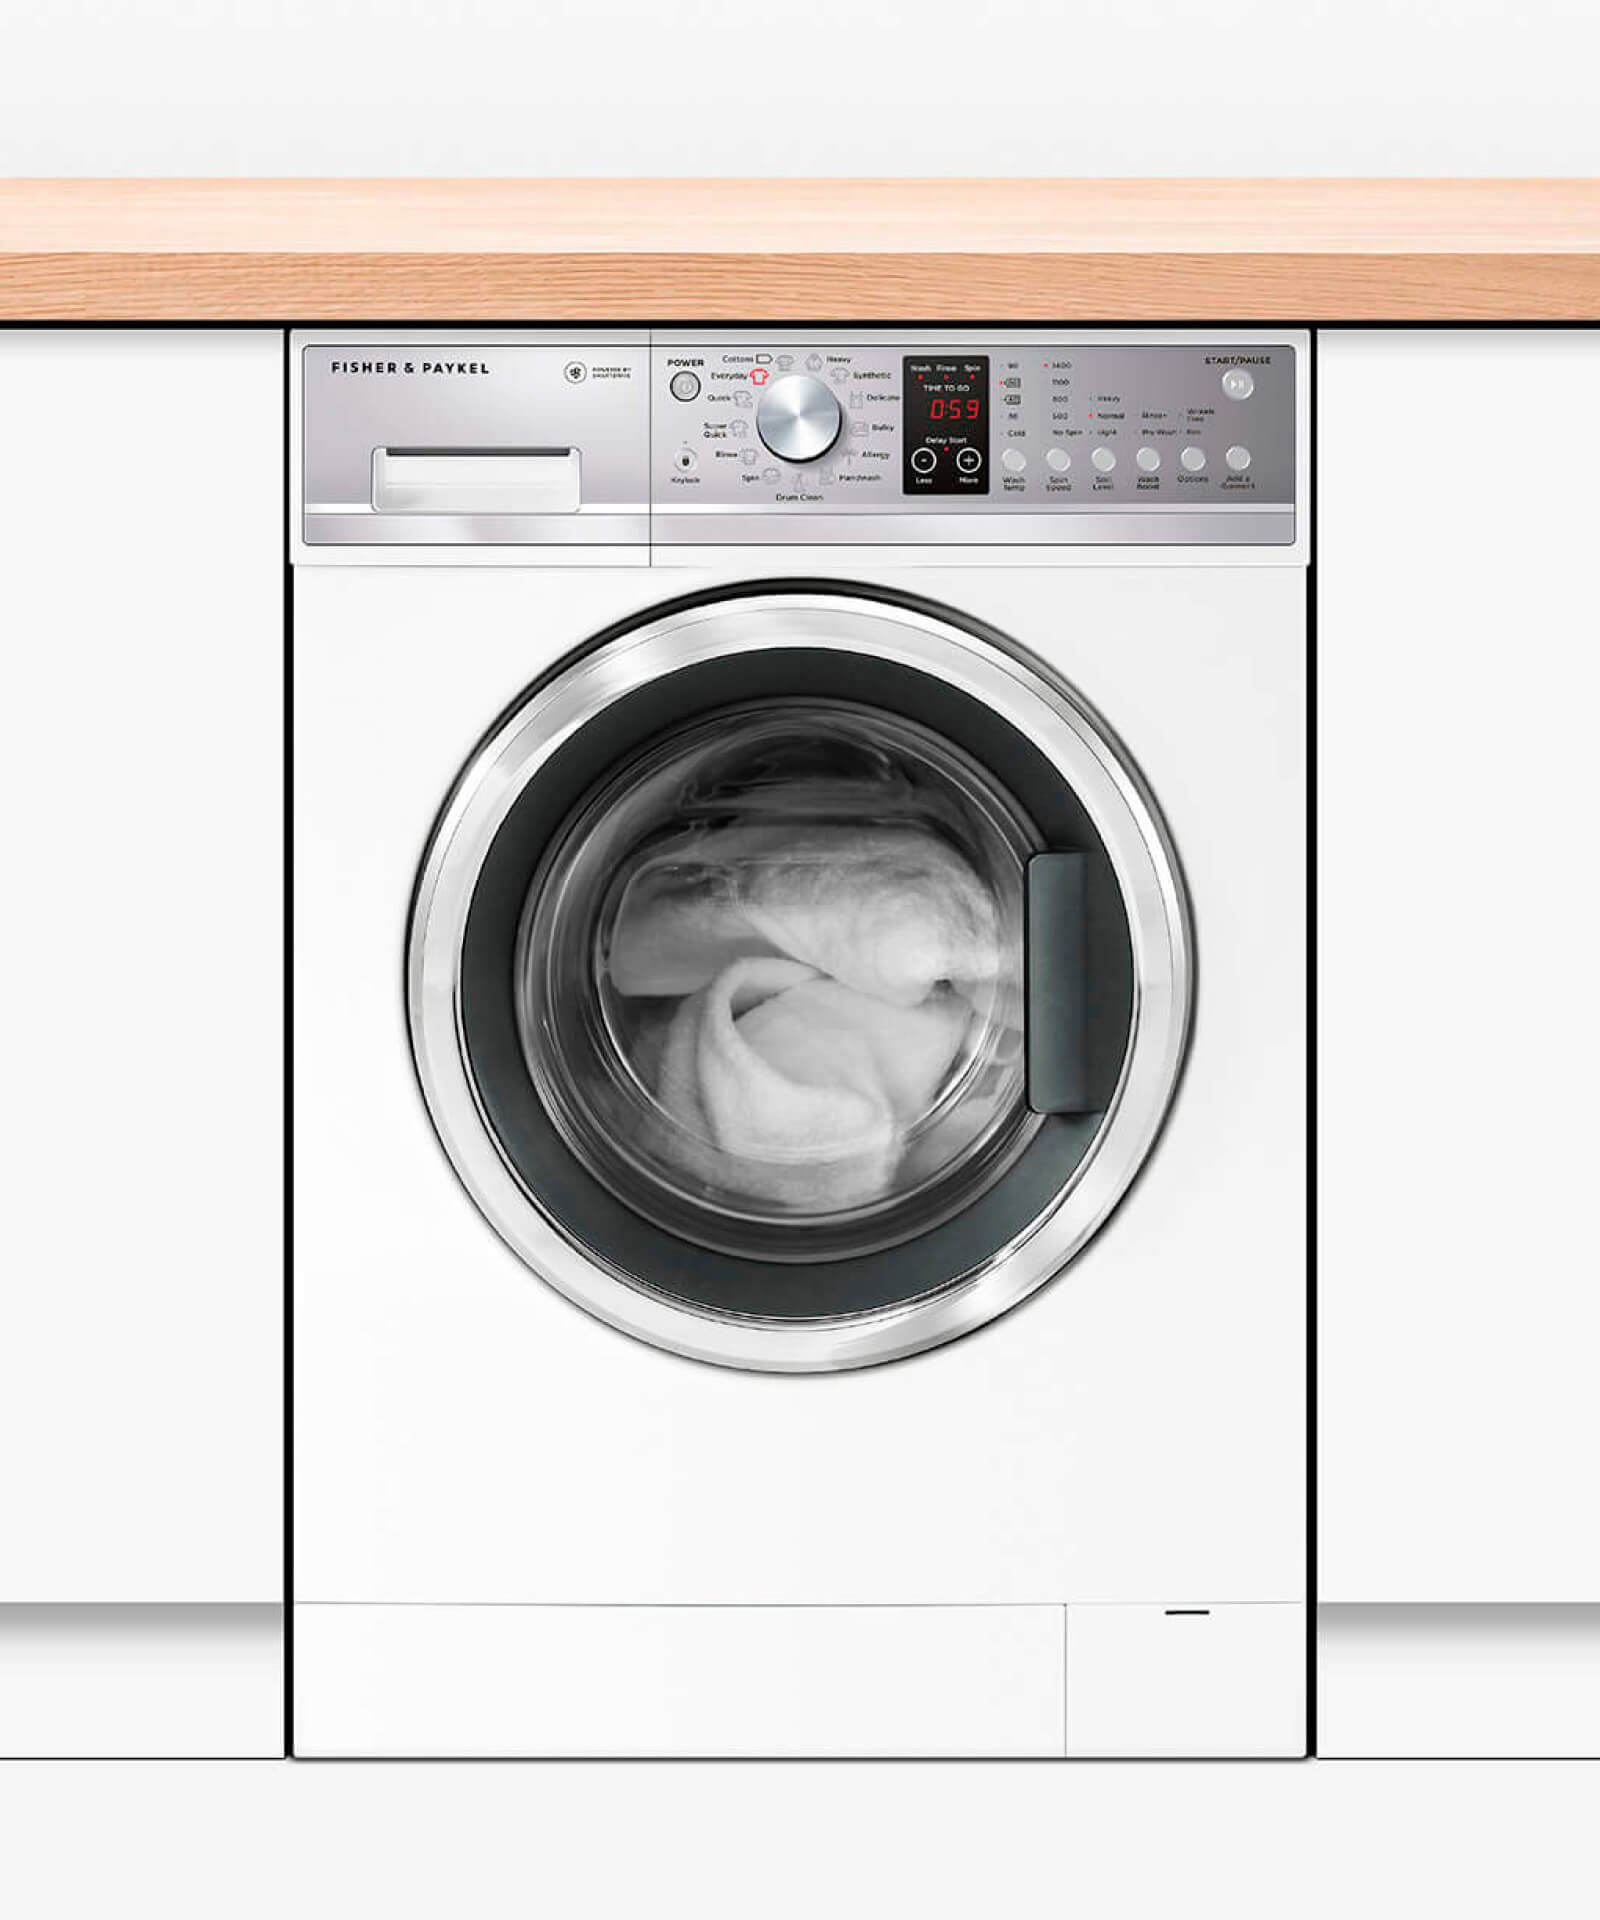 Wm1490p1 9kg Washing Machine With 14 Wash Profiles